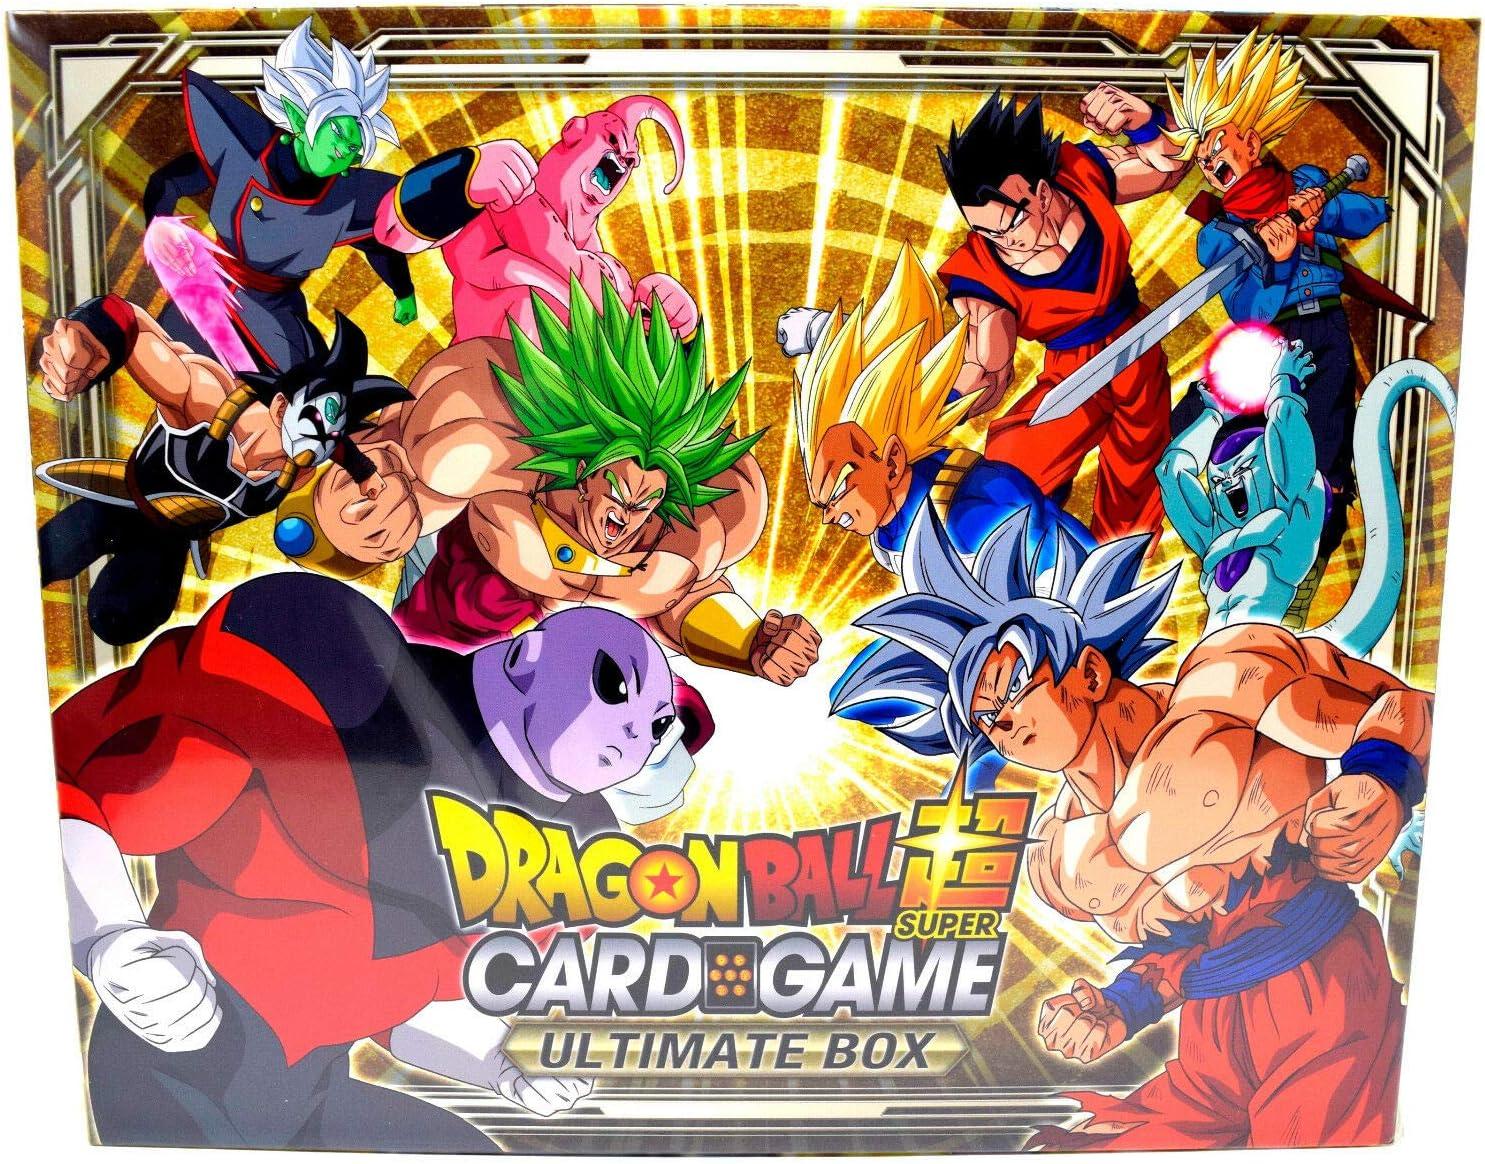 Free shipping! 2018 Dragon Ball Super Bandai TCG Ultimate Box Set CARDS ONLY